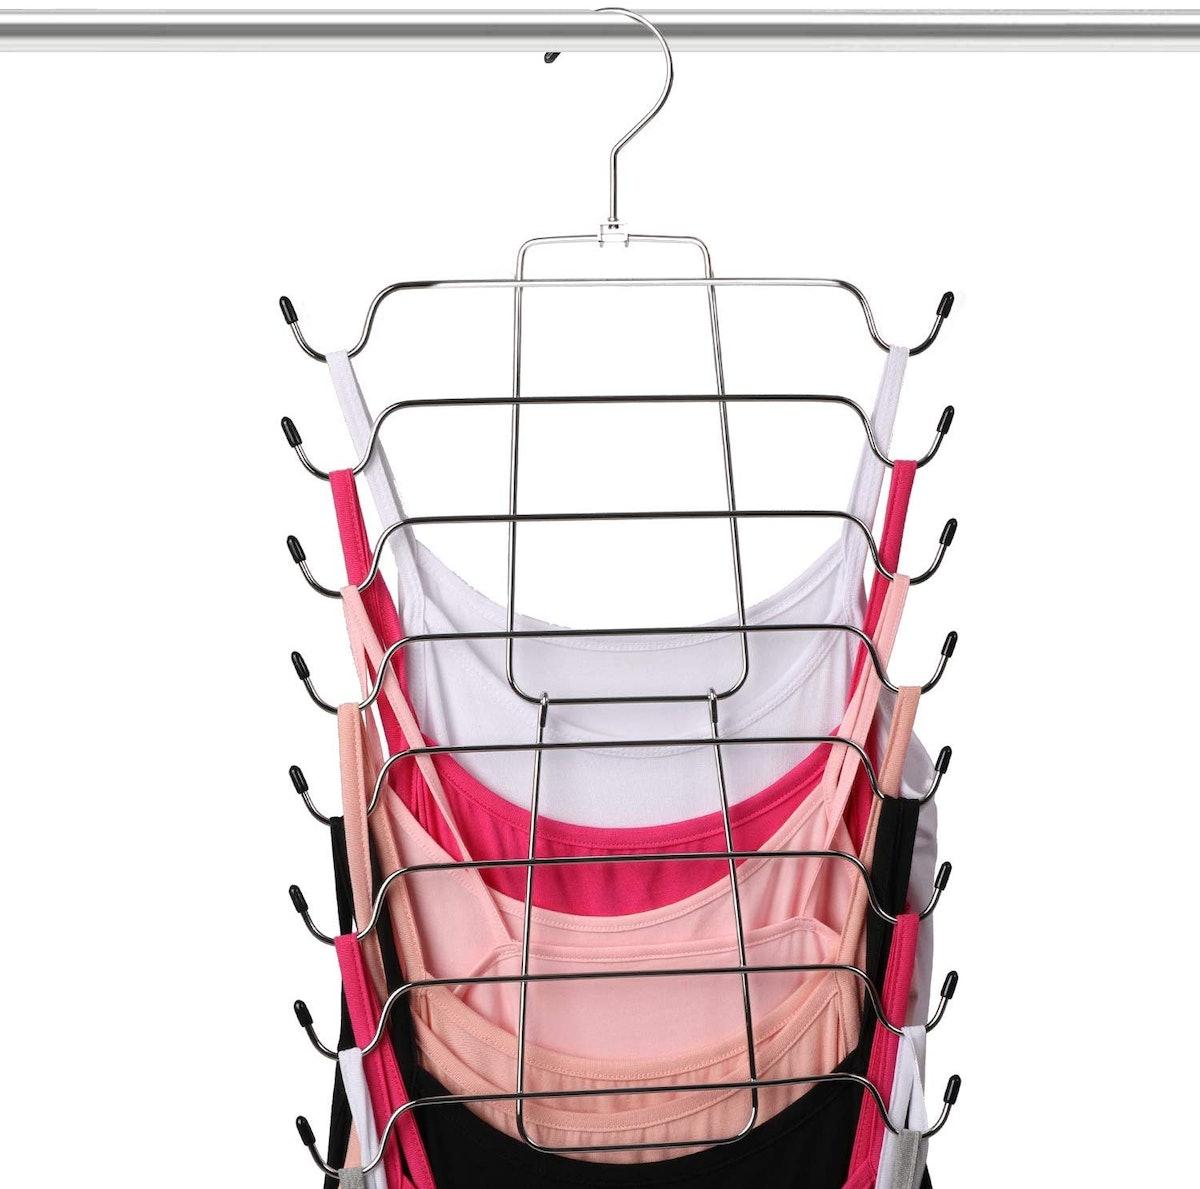 Magicool Space Saving Hangers (2-pack)